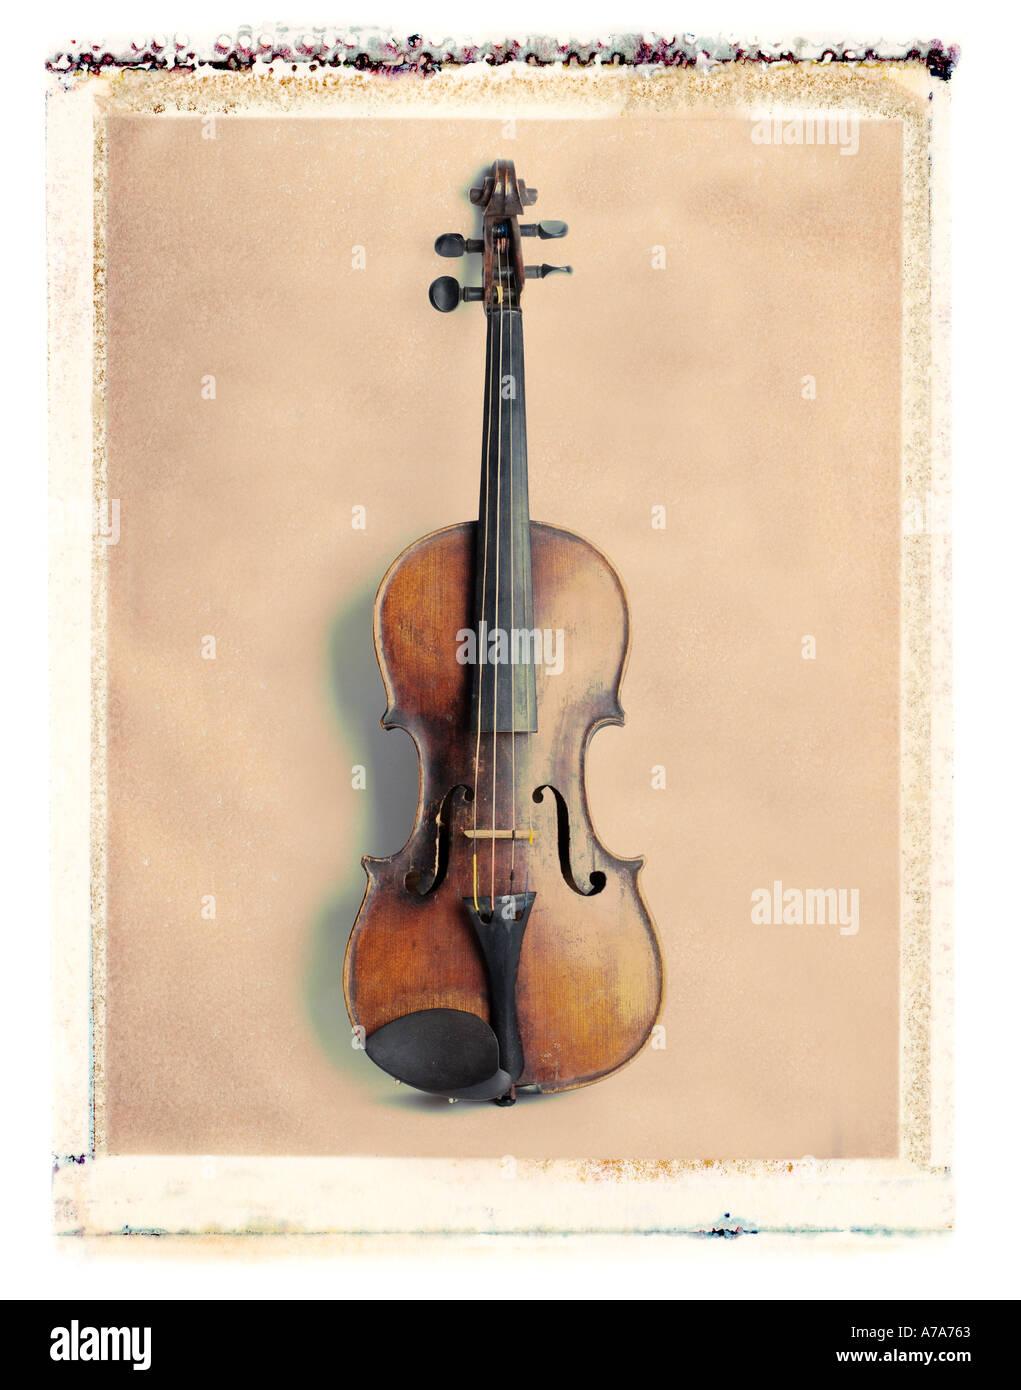 antique violin - Stock Image